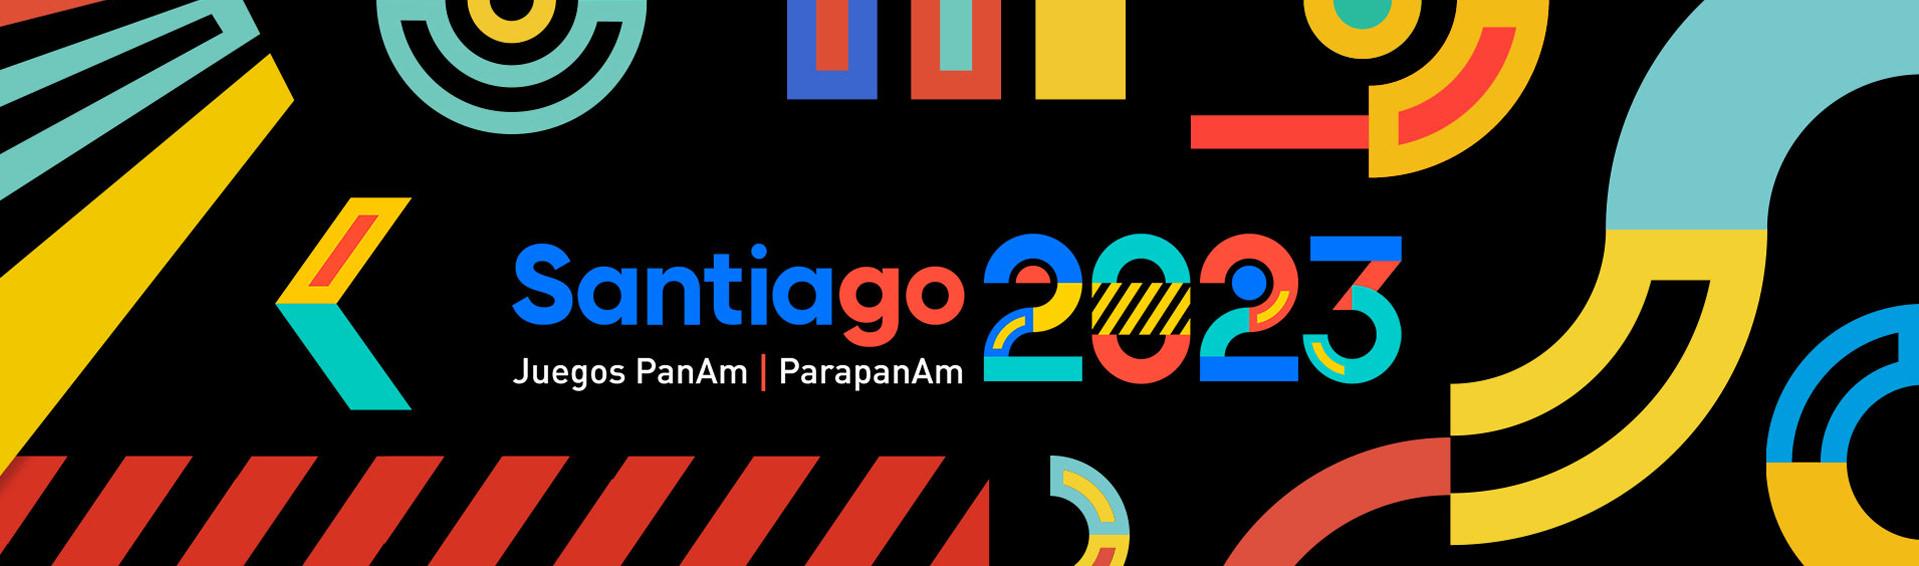 Juegos Panam / Parapanam